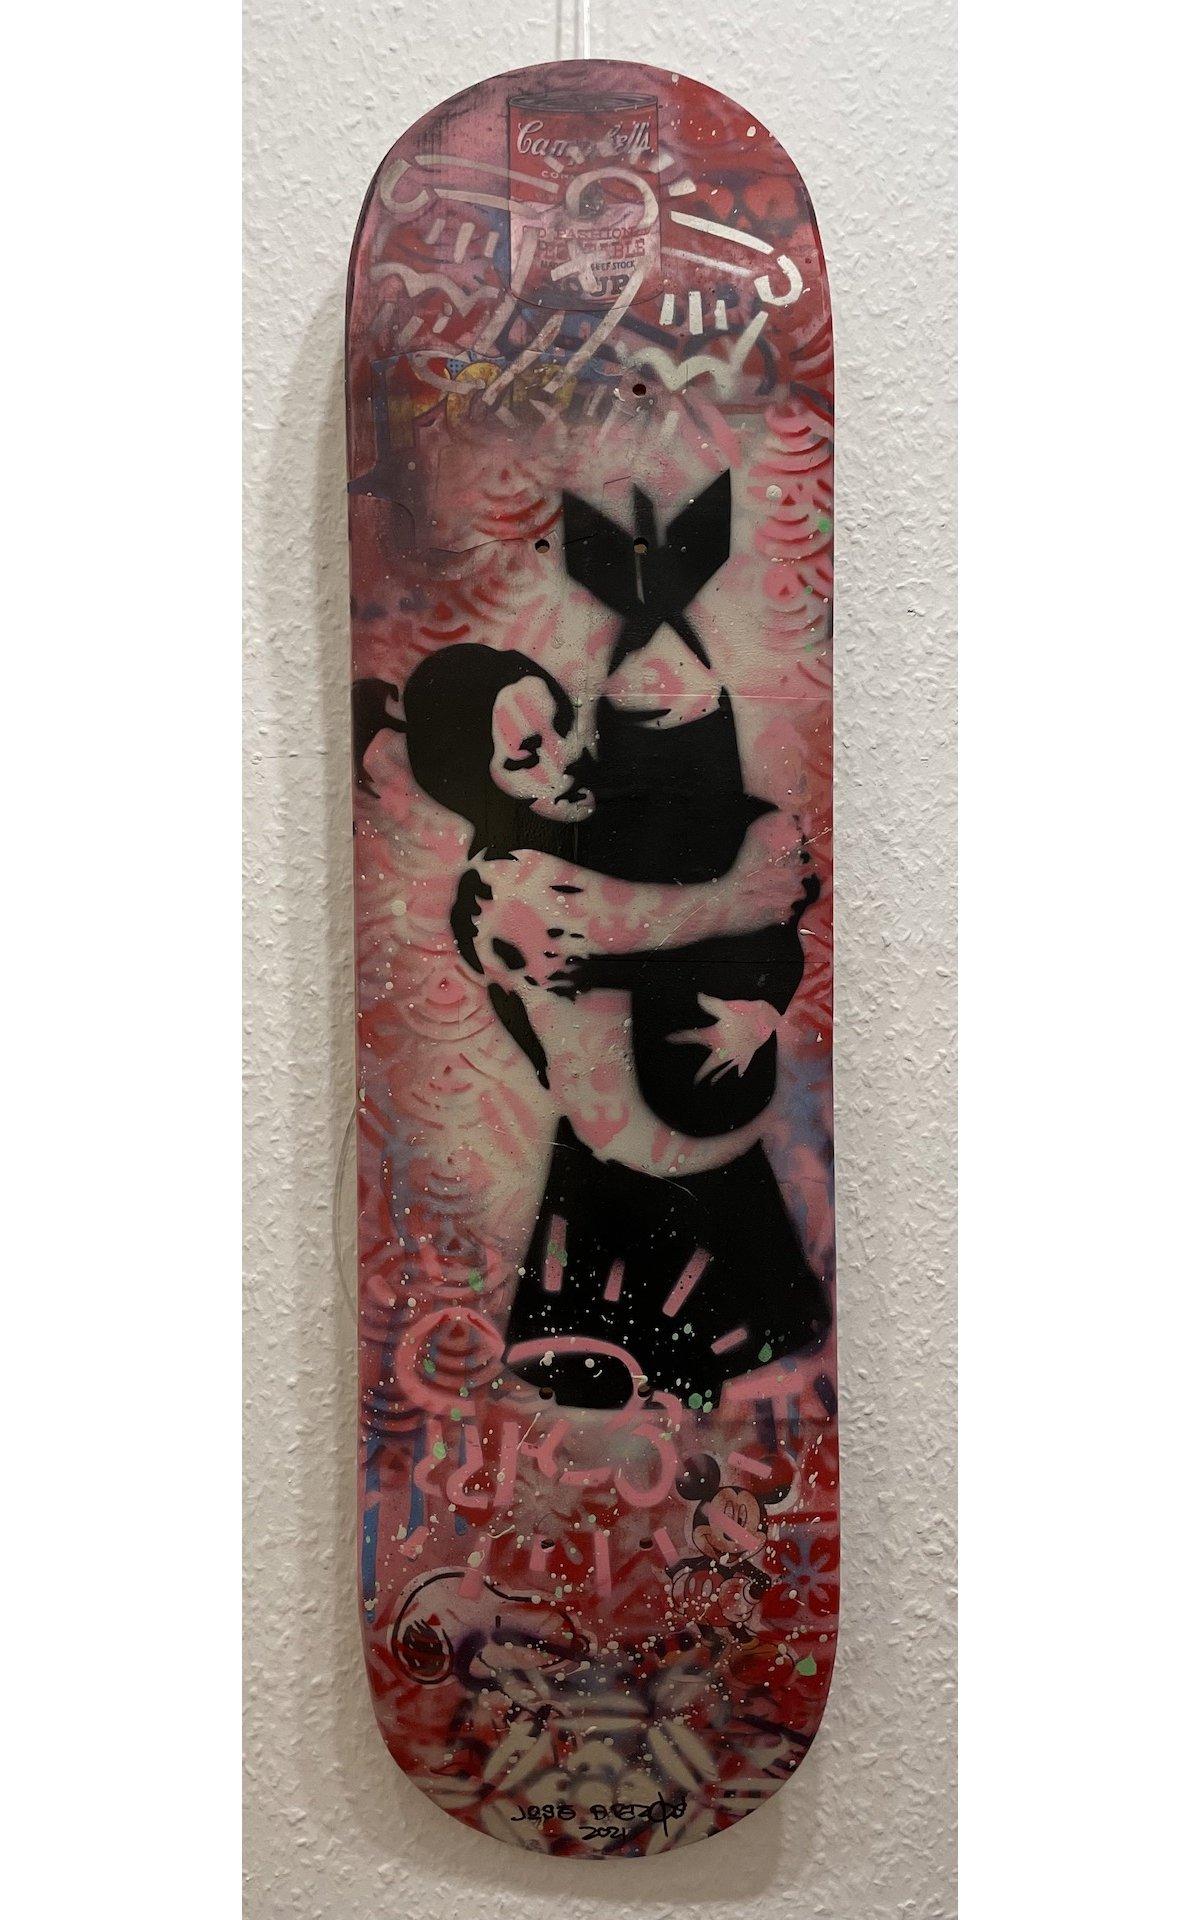 skatebomb-skateart-josedepazos-popart-streetart-gallery-hamburg-popstreetshop